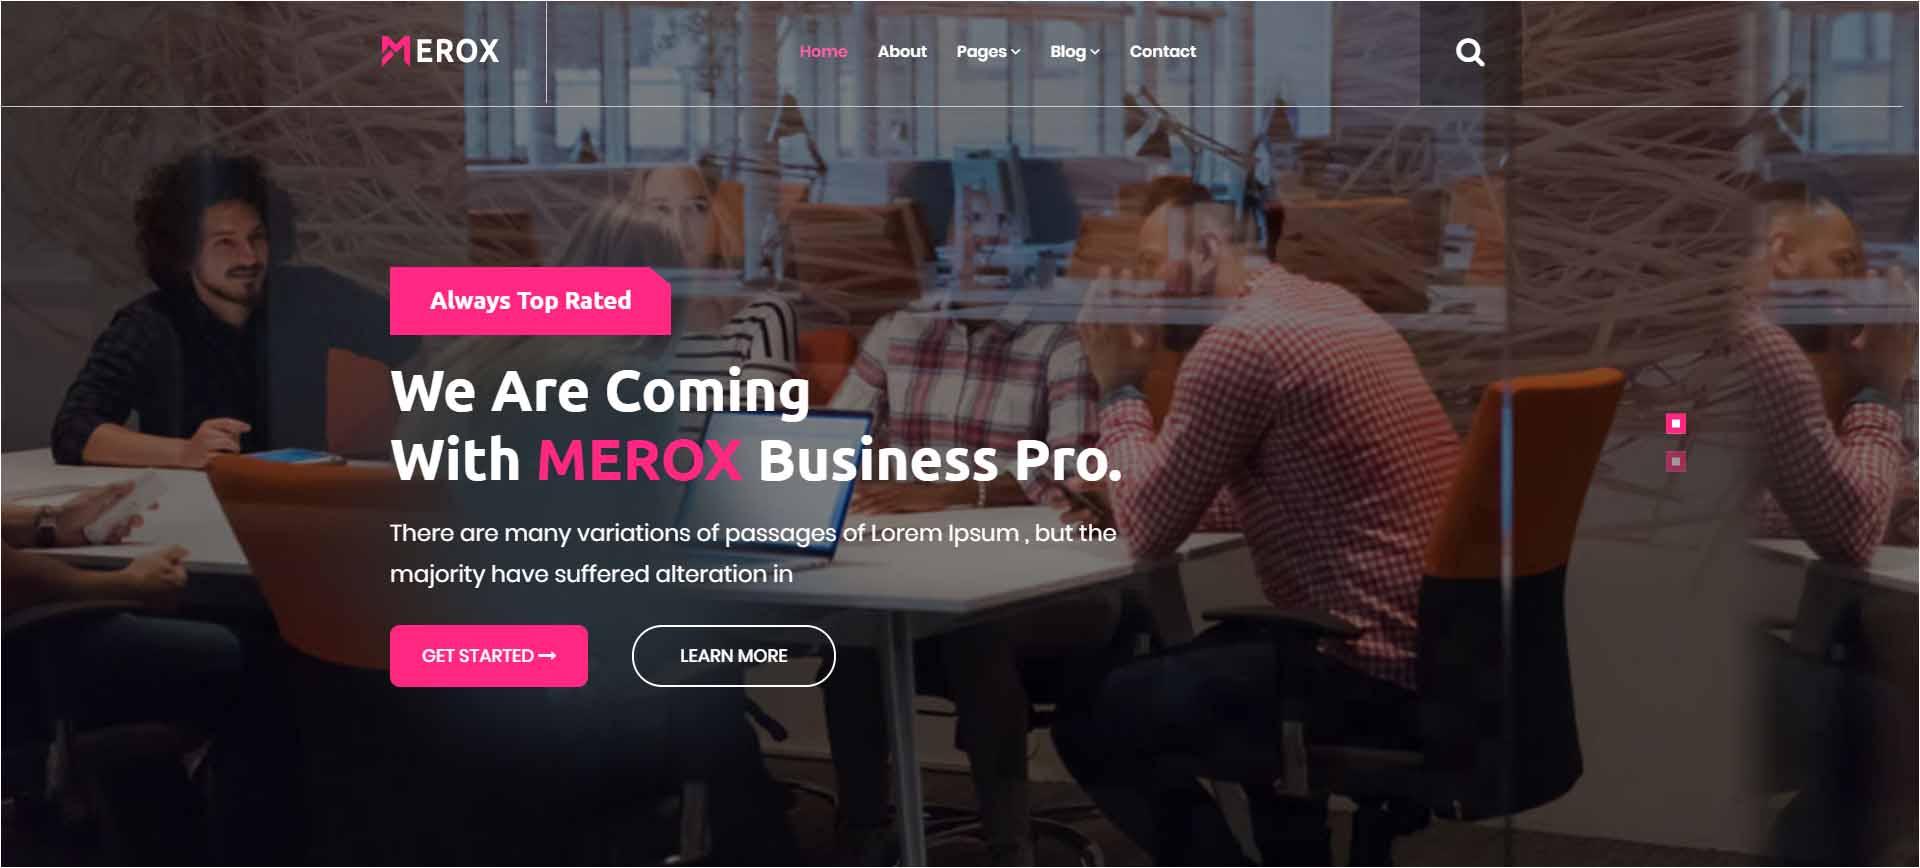 Merox Corporate HTML5 Template